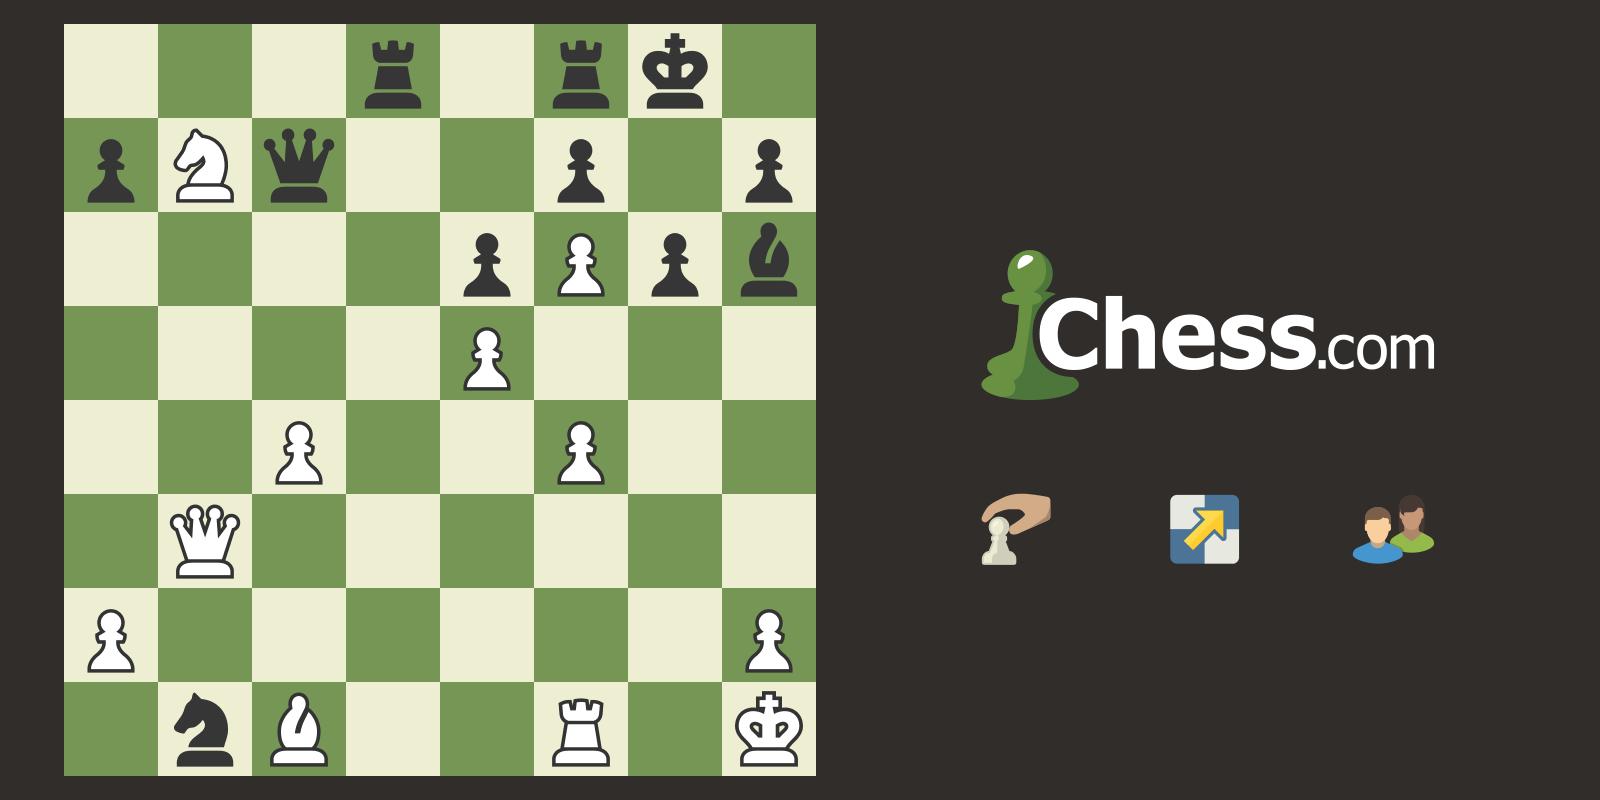 Chess napoleon123456 vs ijacek77 Chess game